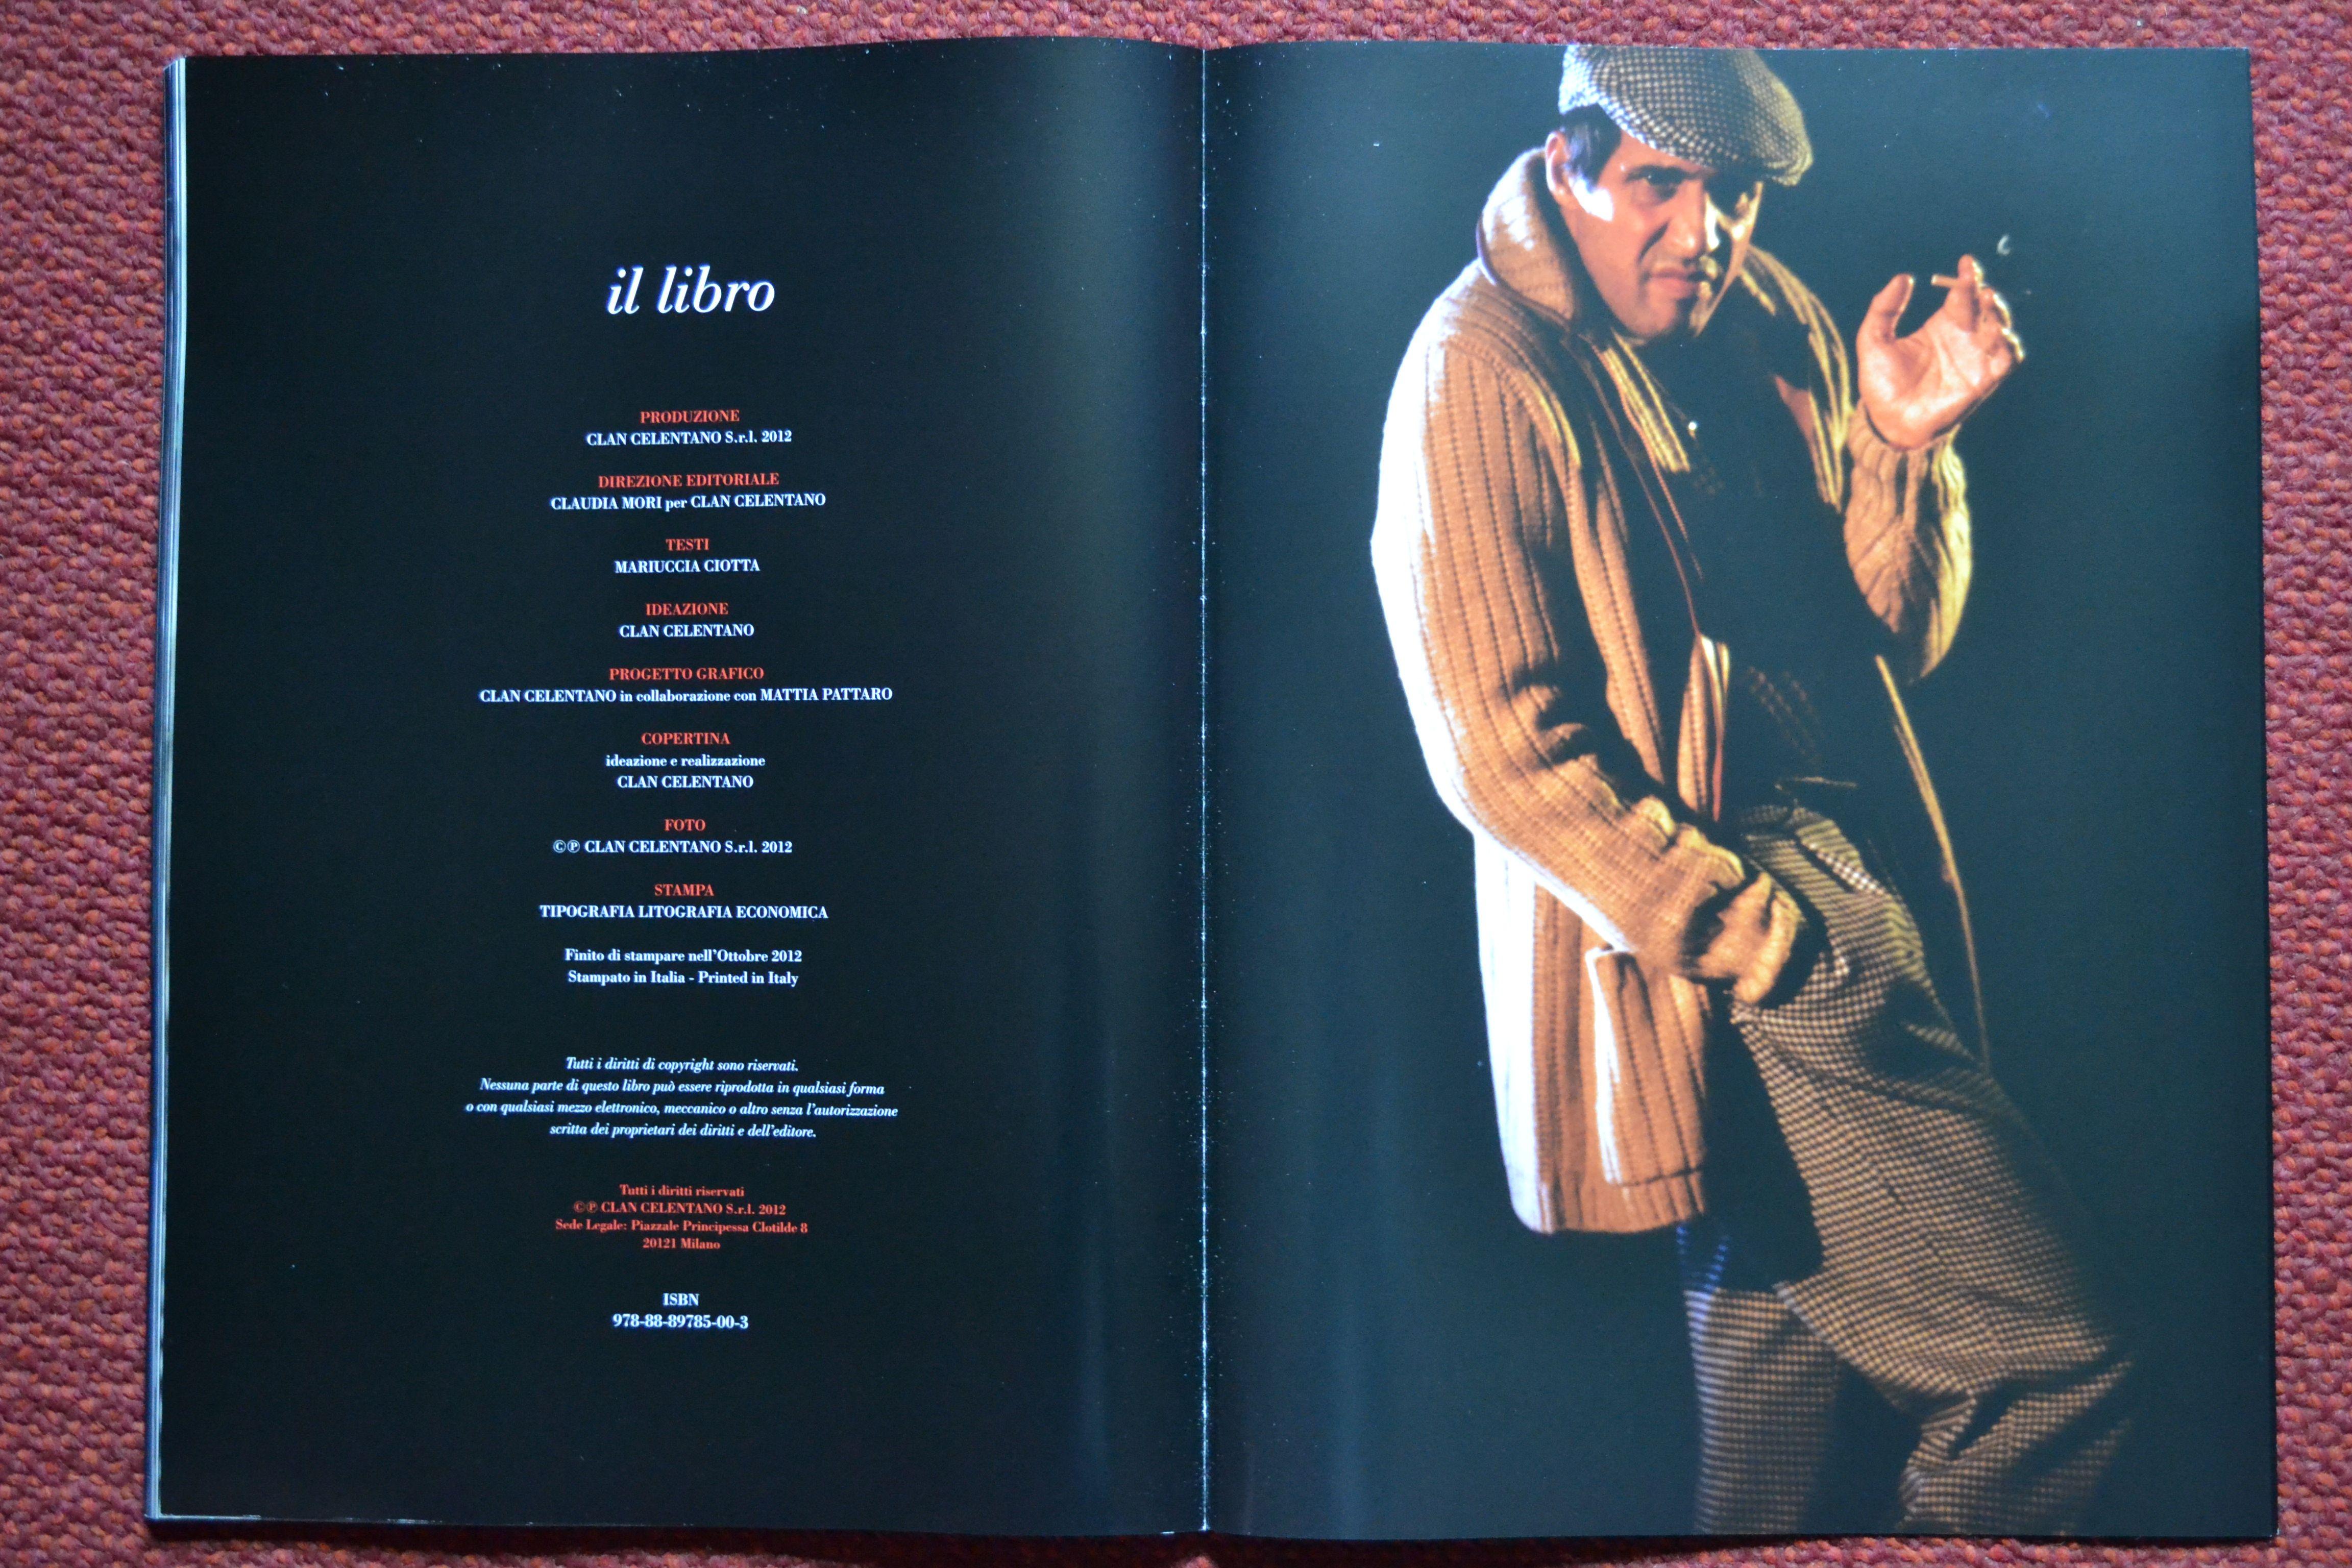 Pin Von Eva Smidt Auf Adriano Celentano In 2019